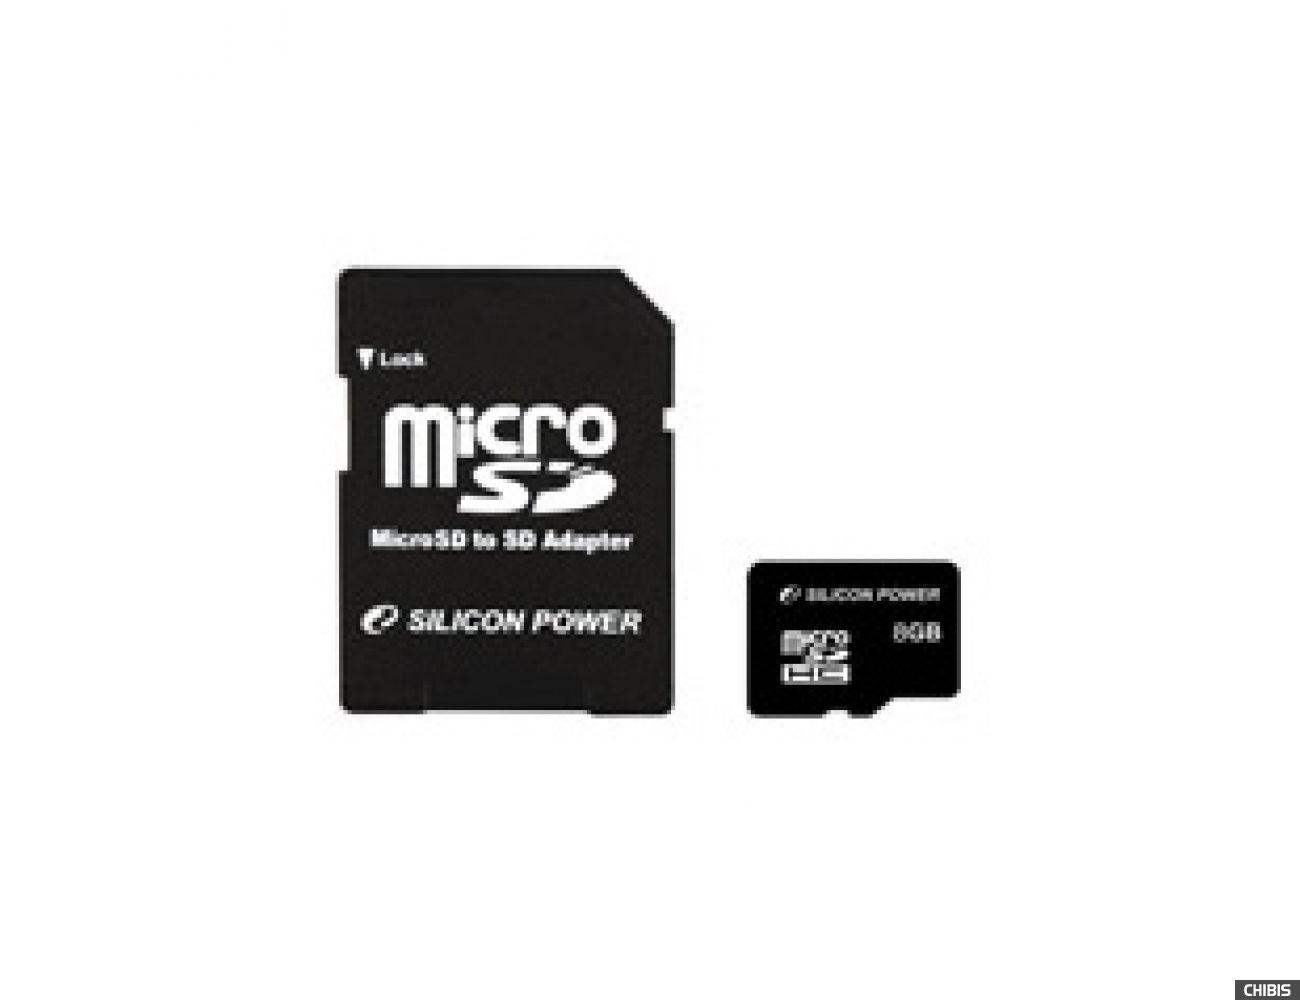 Карта памяти SILICON POWER MicroSDHC 8 GB card Class 4 no adapter